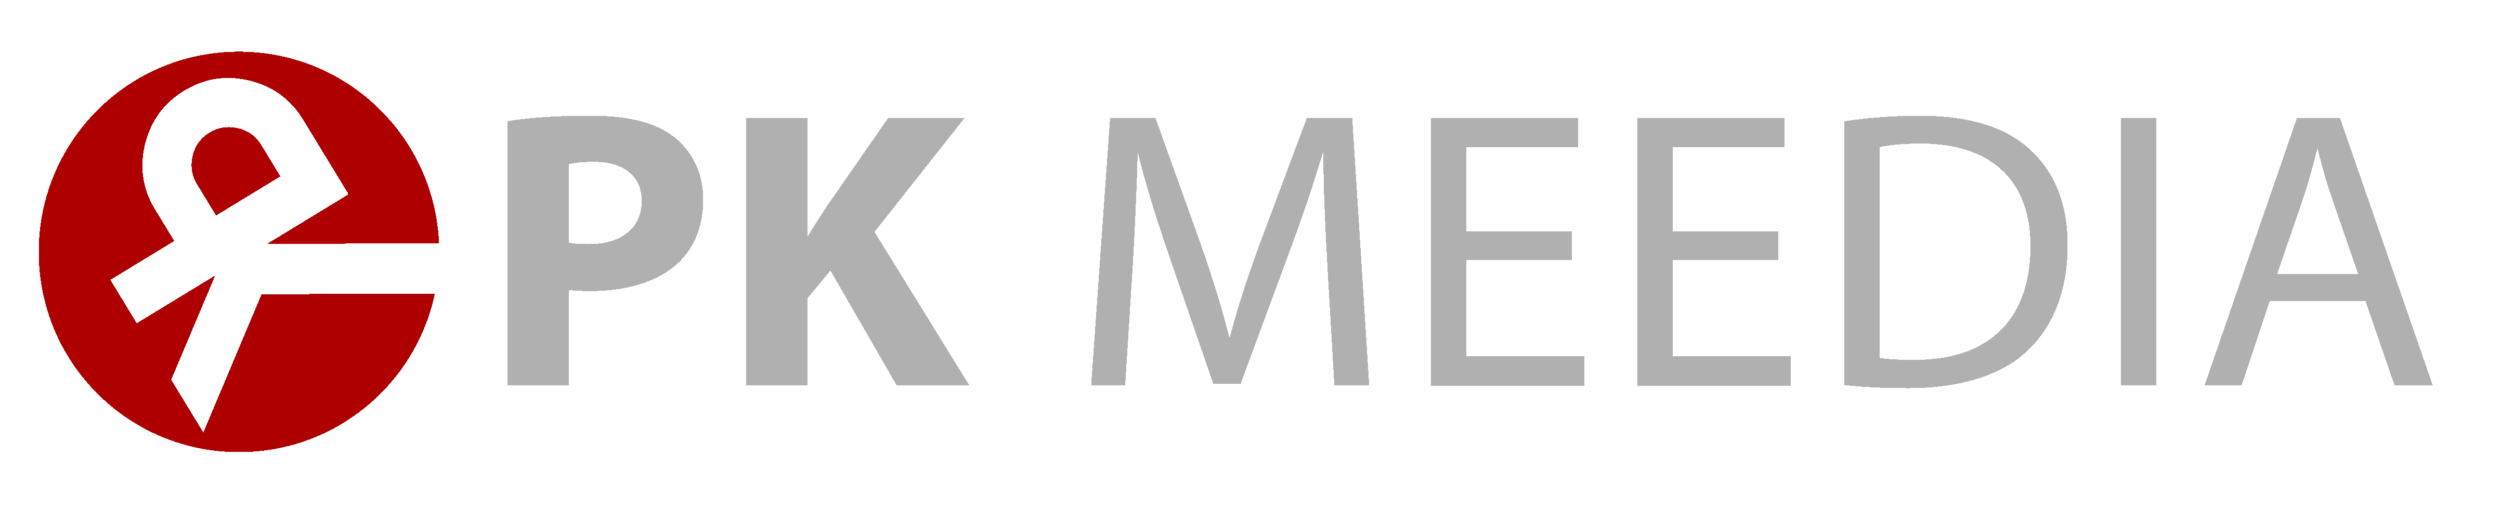 PK-Meedia